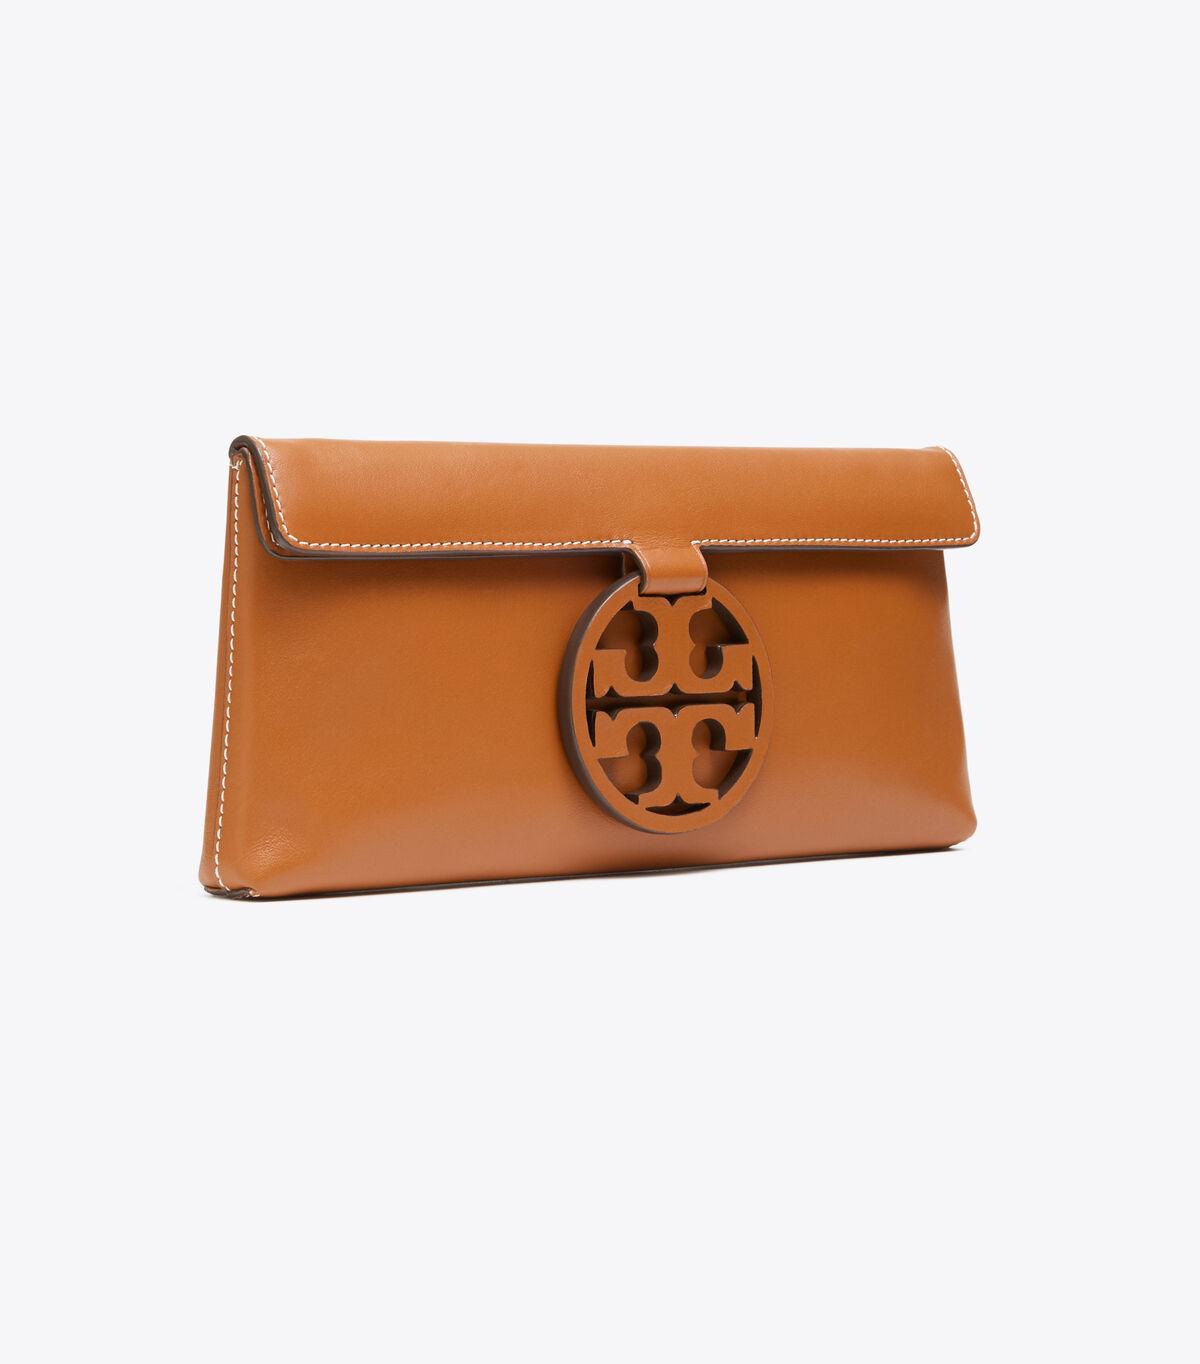 حقيبة يد ميلر/268/ حقائب يد